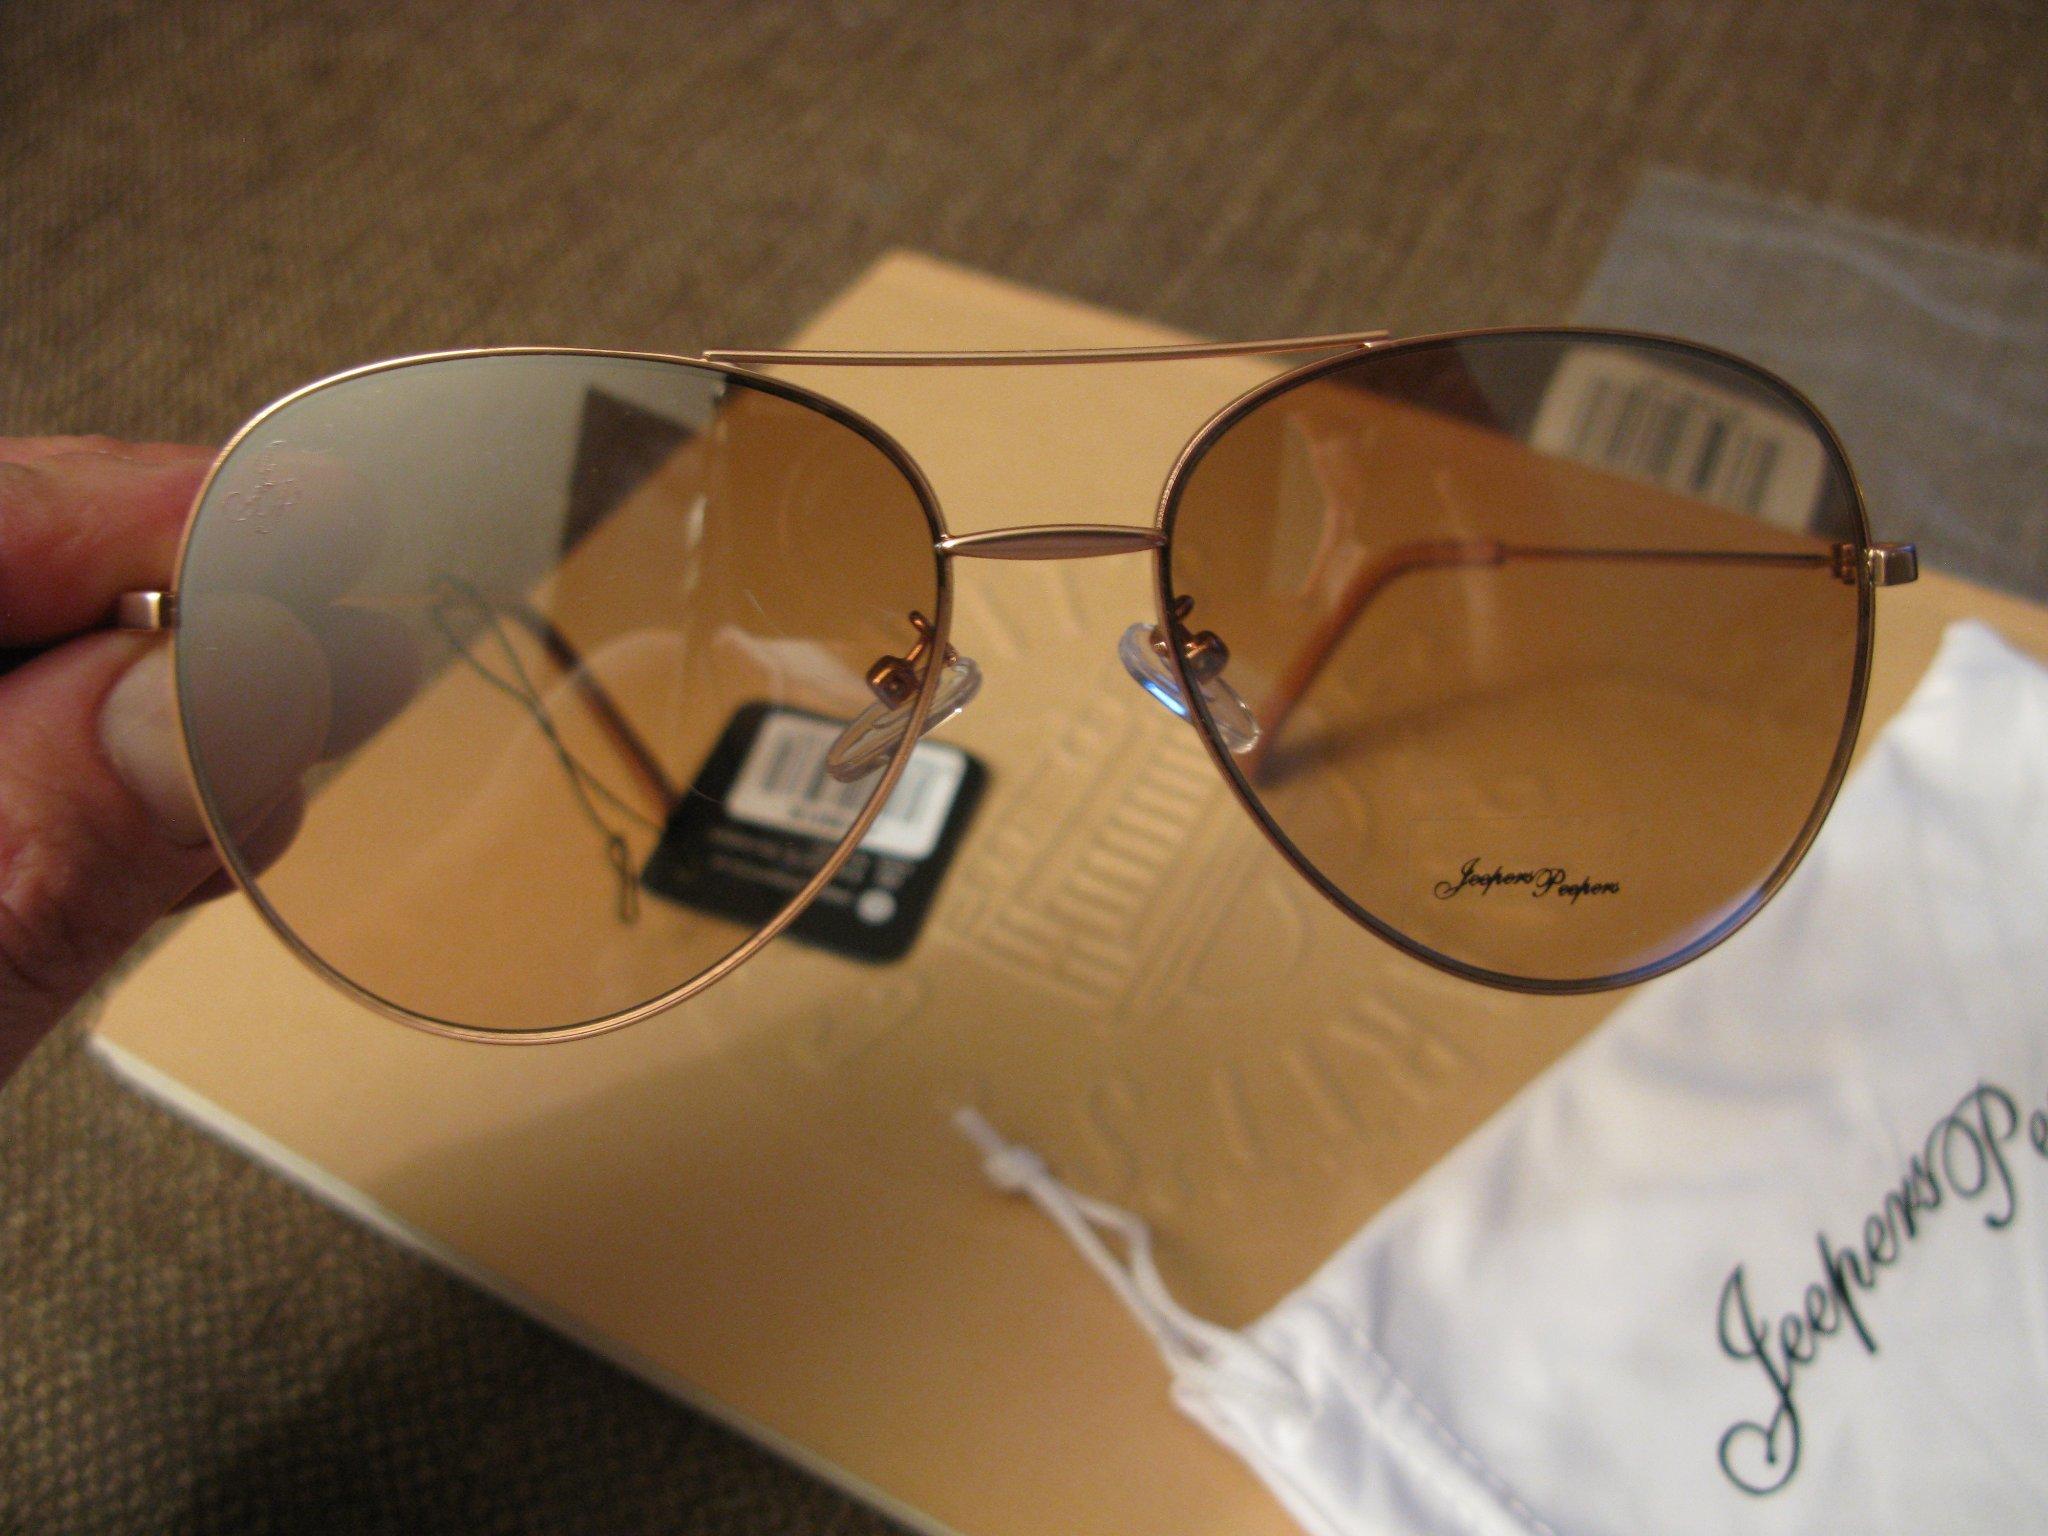 Jeepers Peepers, Solglasögon shades Helt nya! S.. (461115939) | Köp på  Tradera